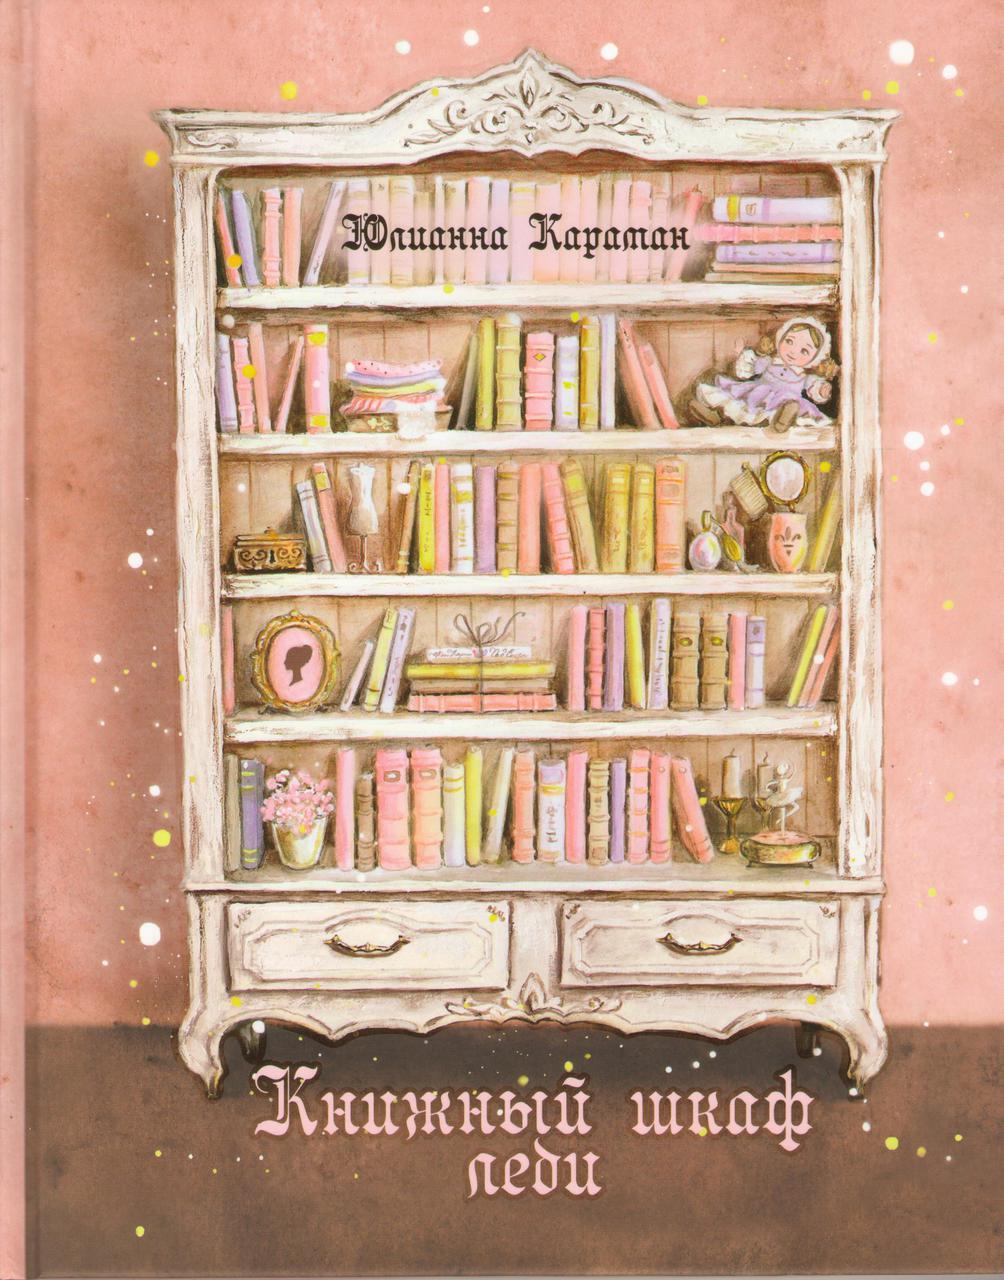 Книжный шкаф леди